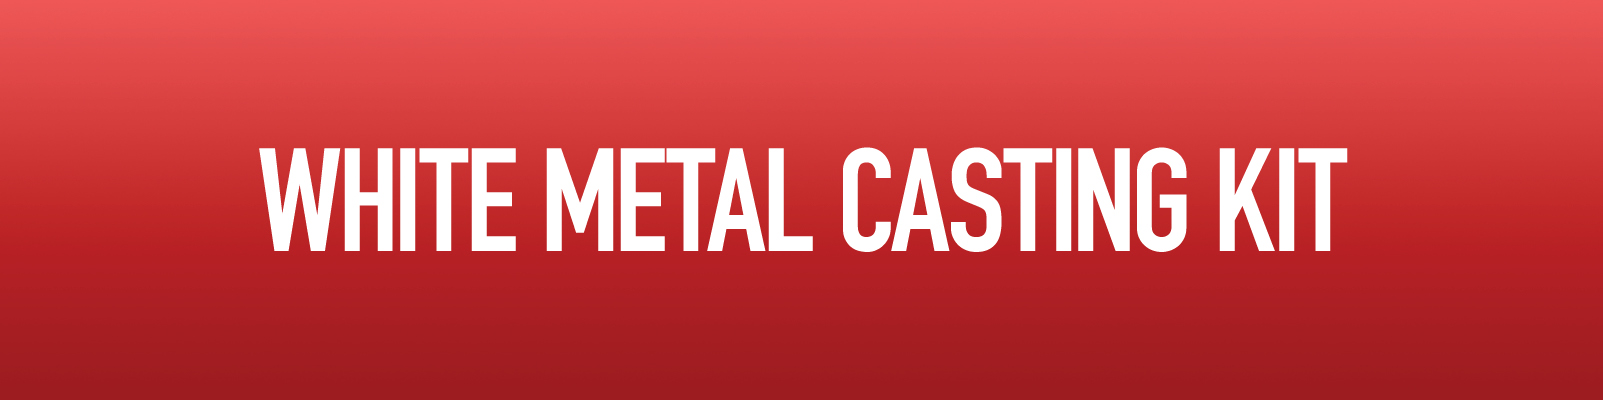 White Metal Casting Kits